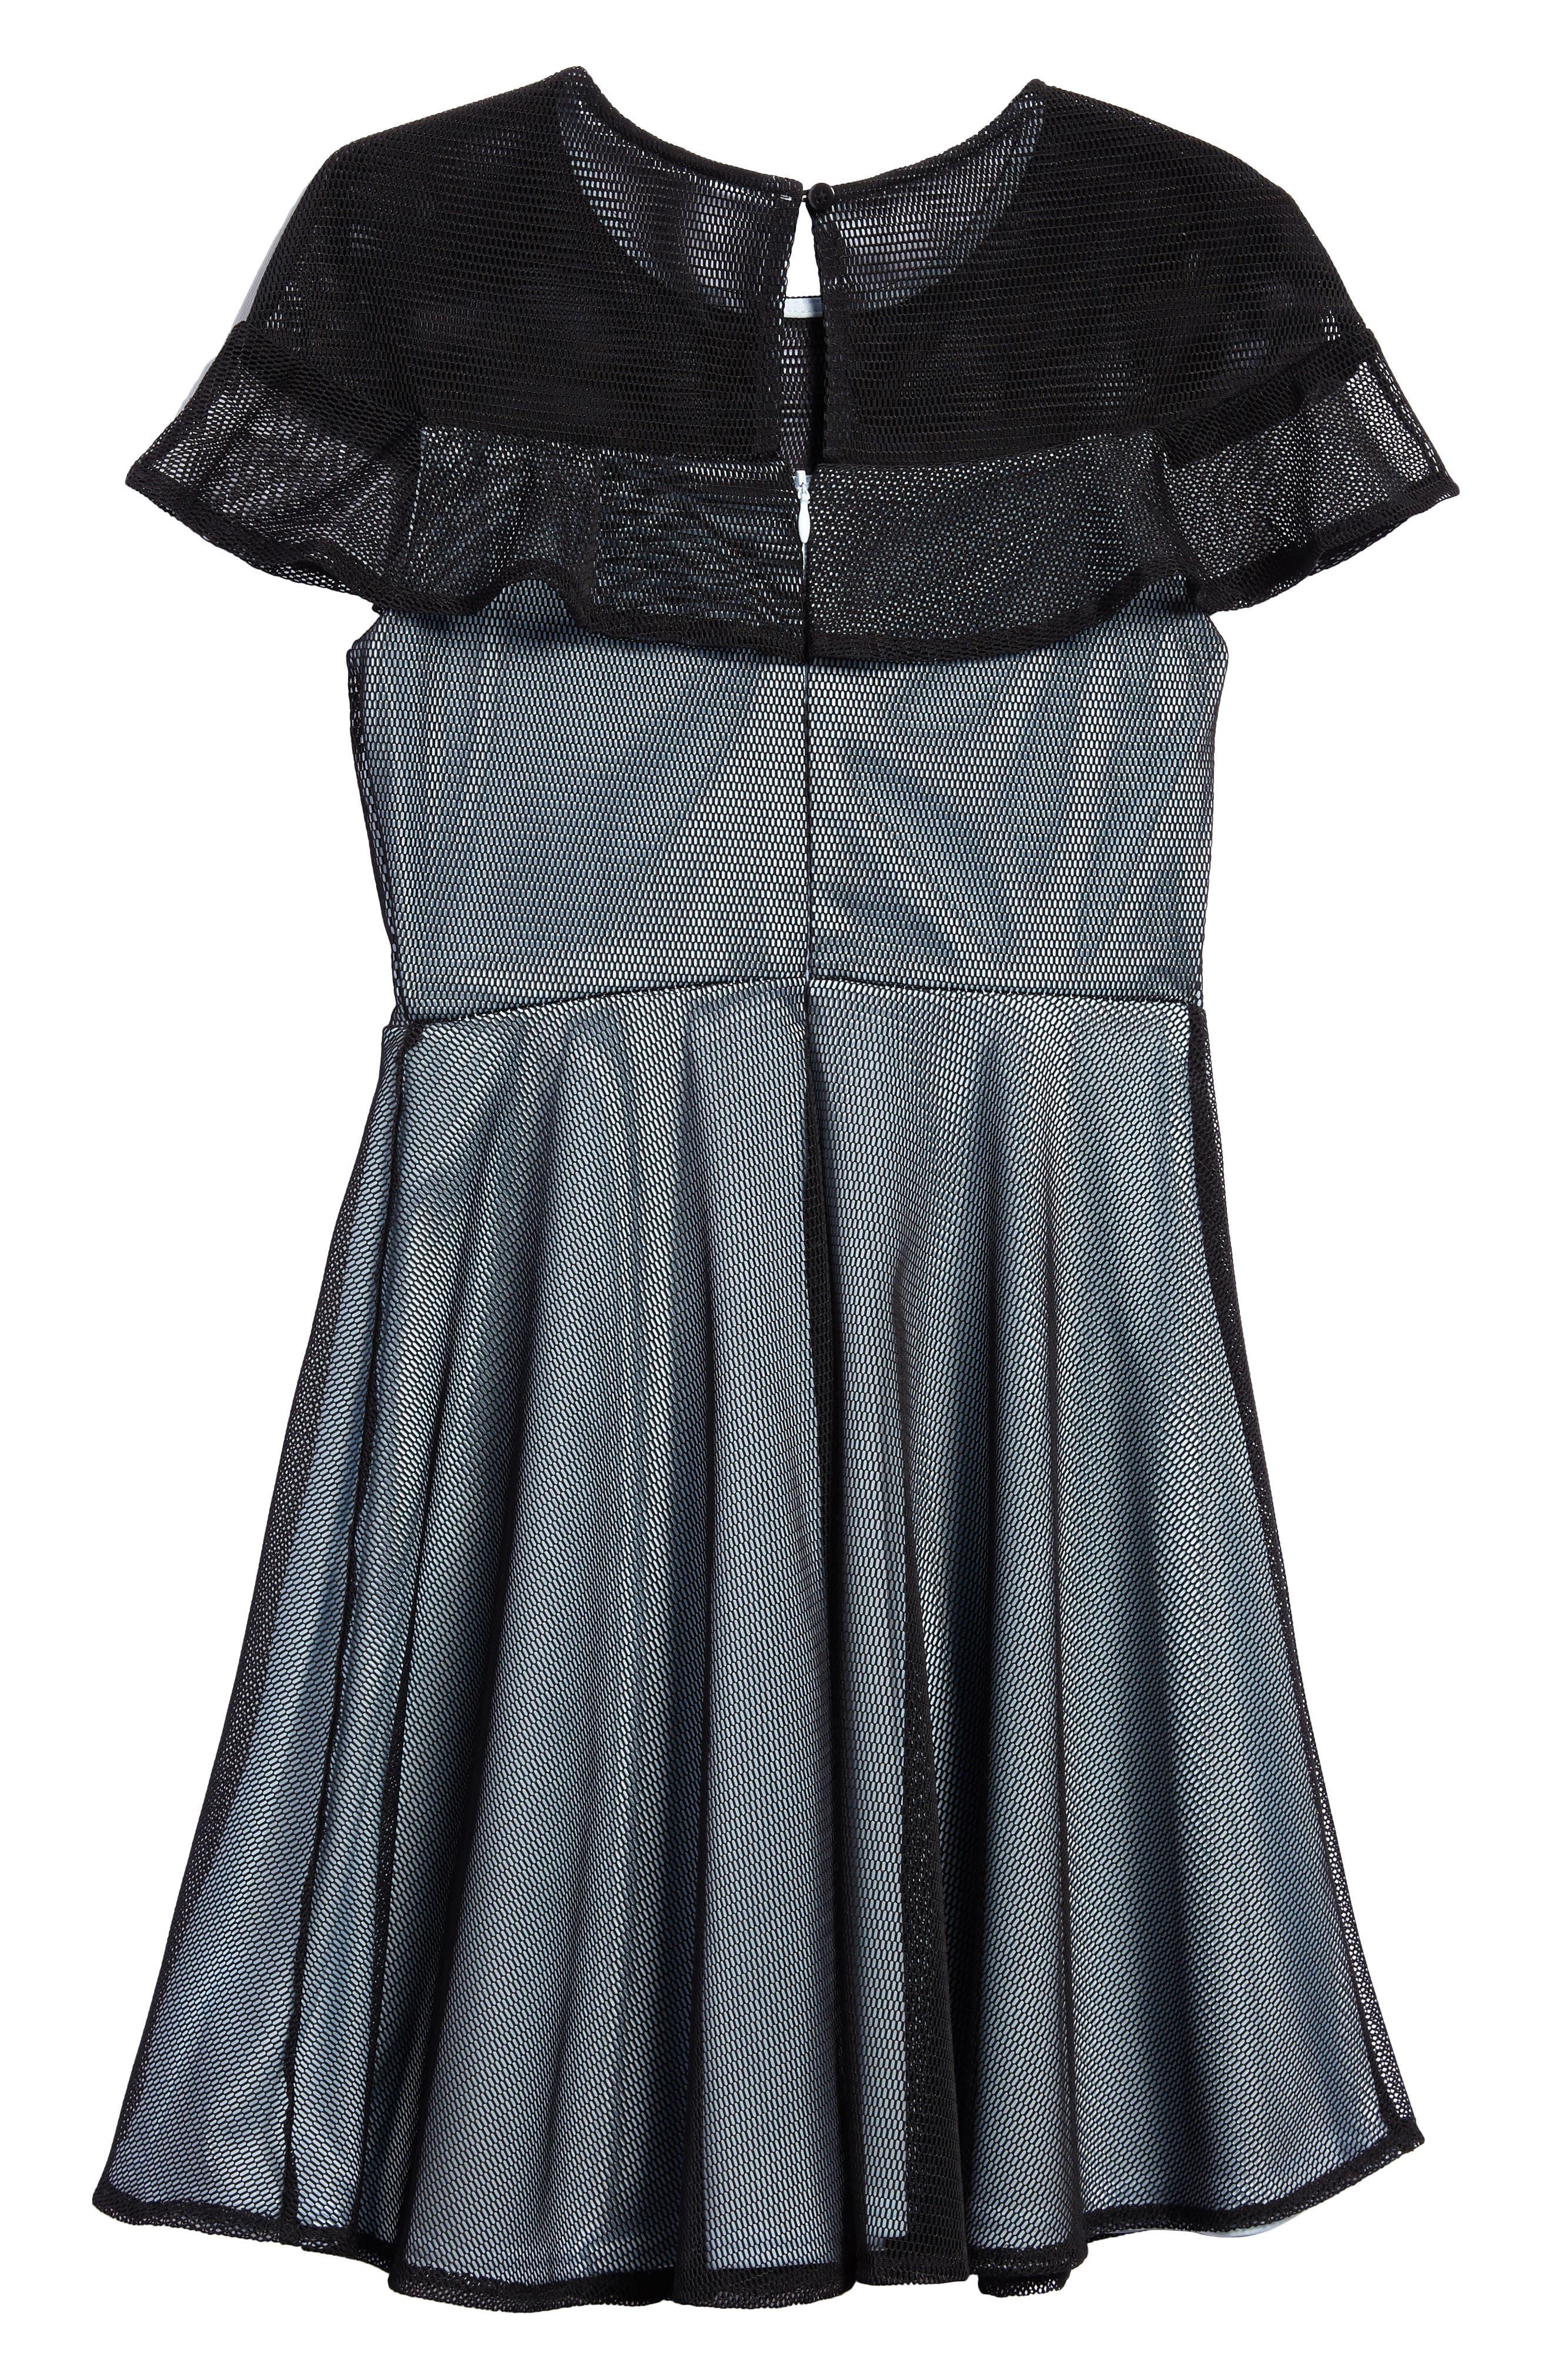 Ruffle Mesh Overlay Dress,                             Alternate thumbnail 2, color,                             Black